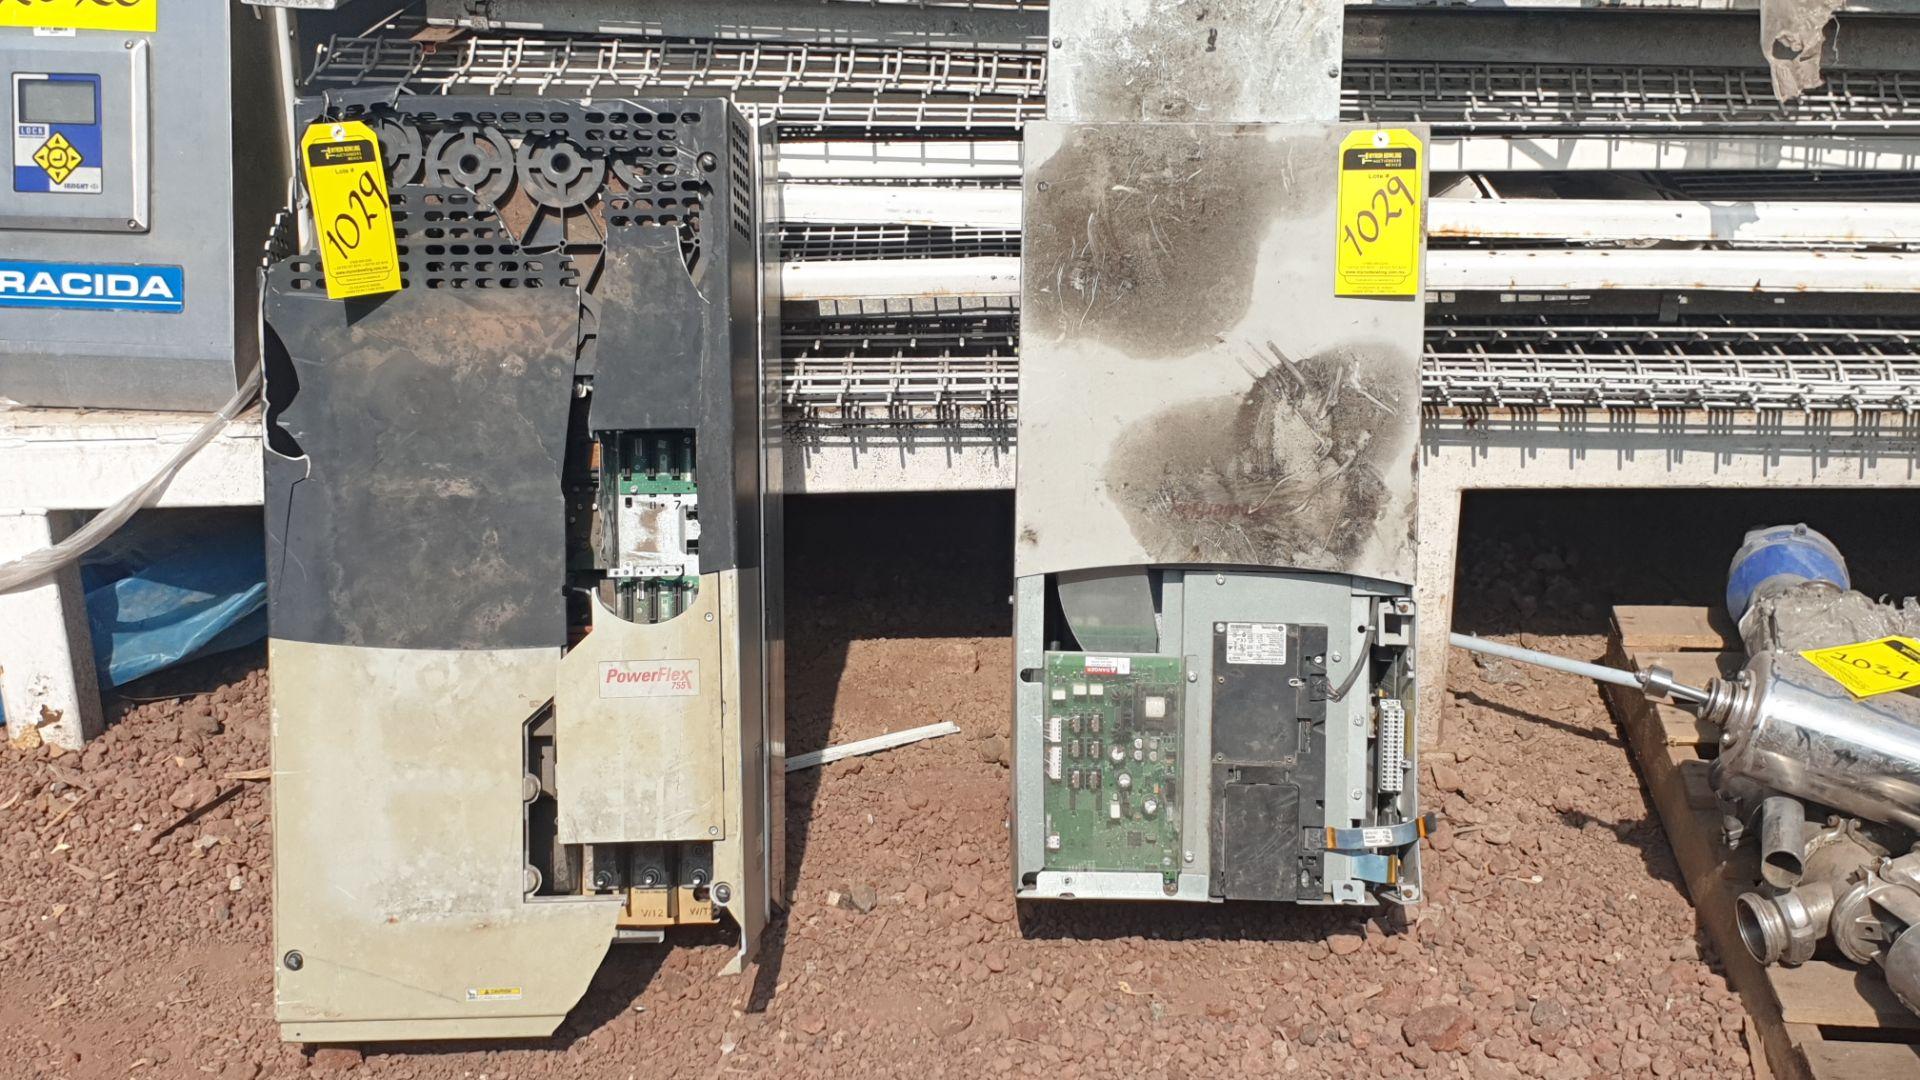 2 Powerflex Variator boards, model 20G1AN, 20BD180A0AYNANC0 - Image 4 of 13